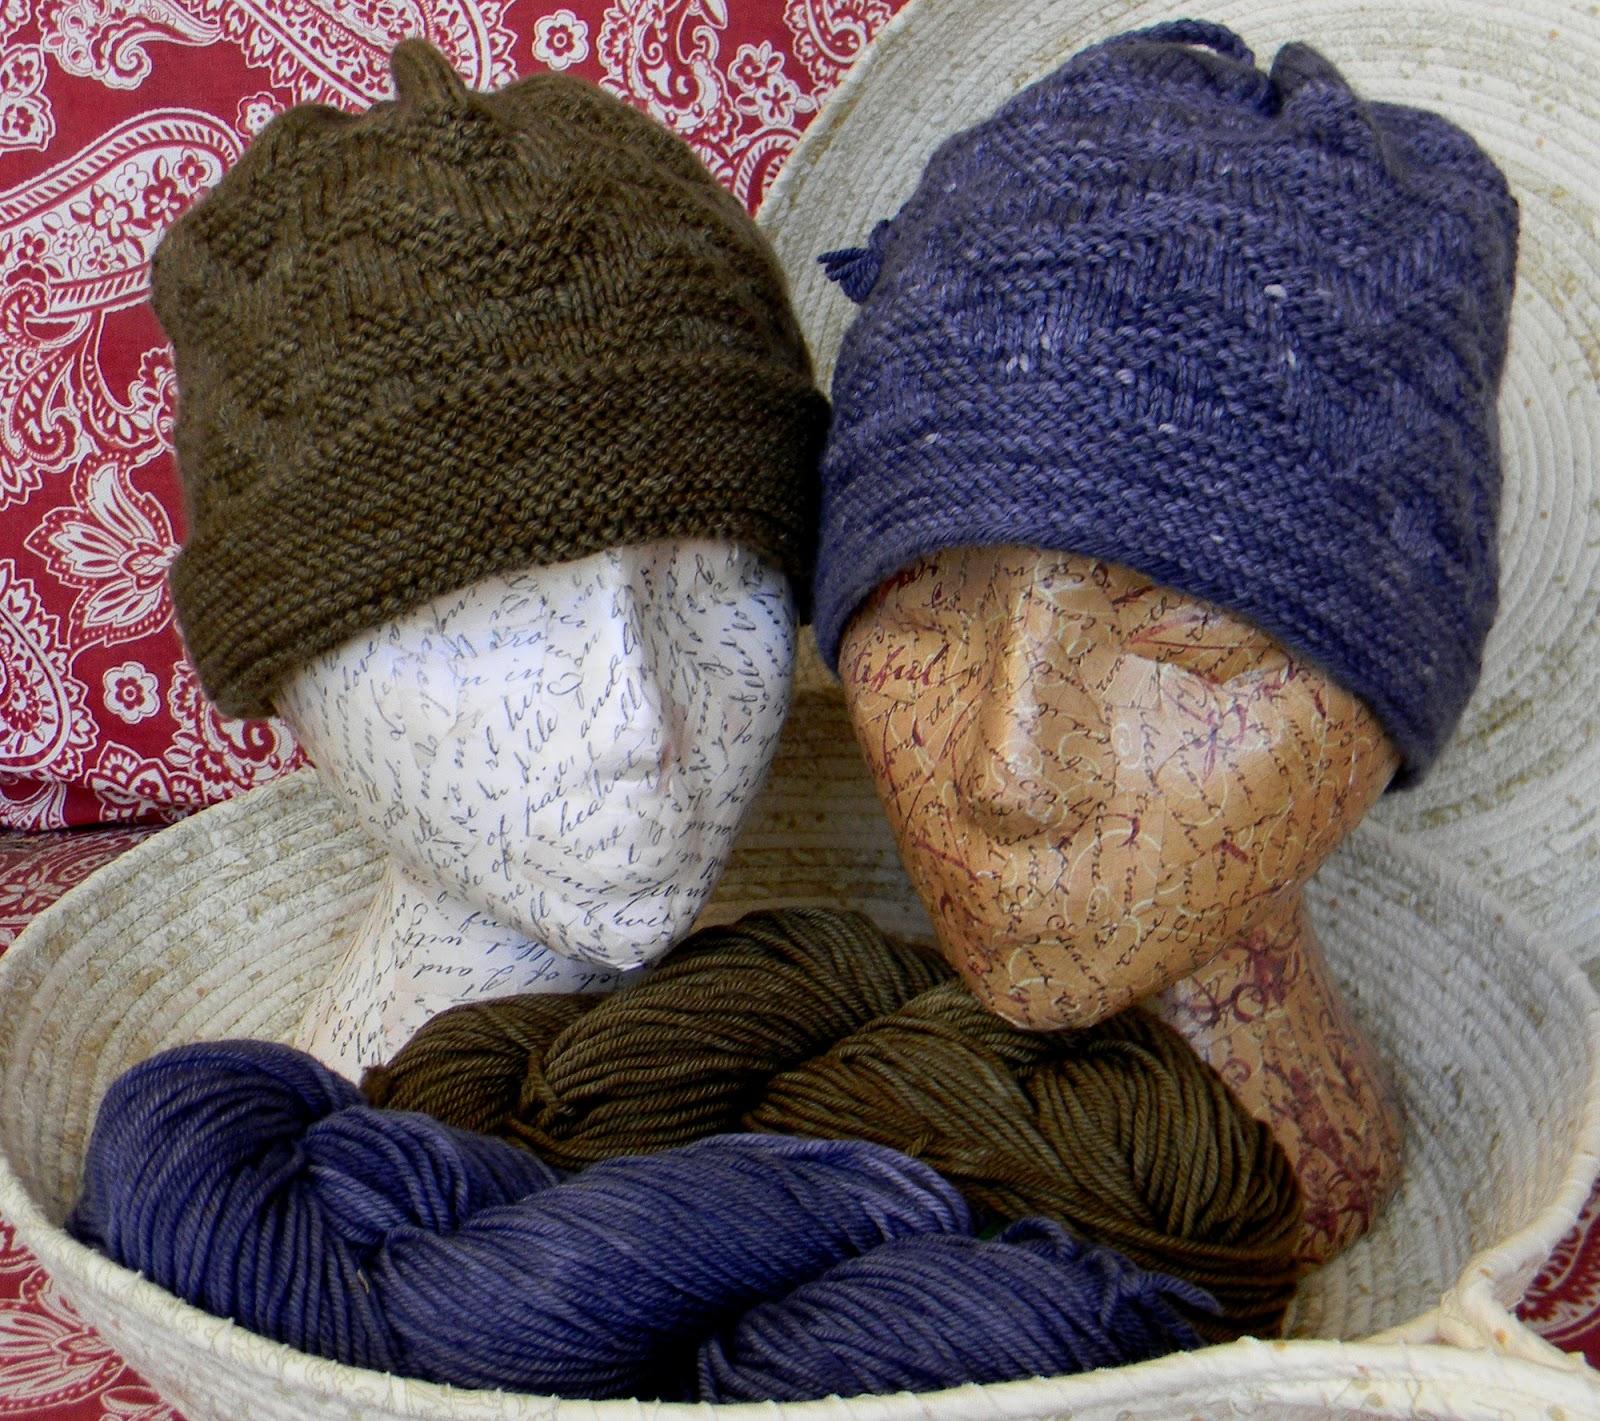 Knit up dye podcast yarn knitting patterns 2015 signature series kit 3 peaks pints hat kit fandeluxe Choice Image